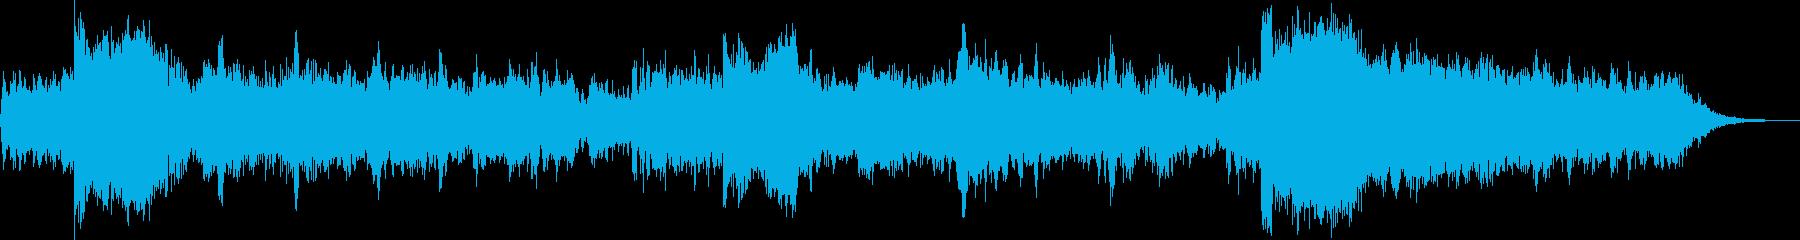 SF音を使ったホラー・宗教サウンドの再生済みの波形